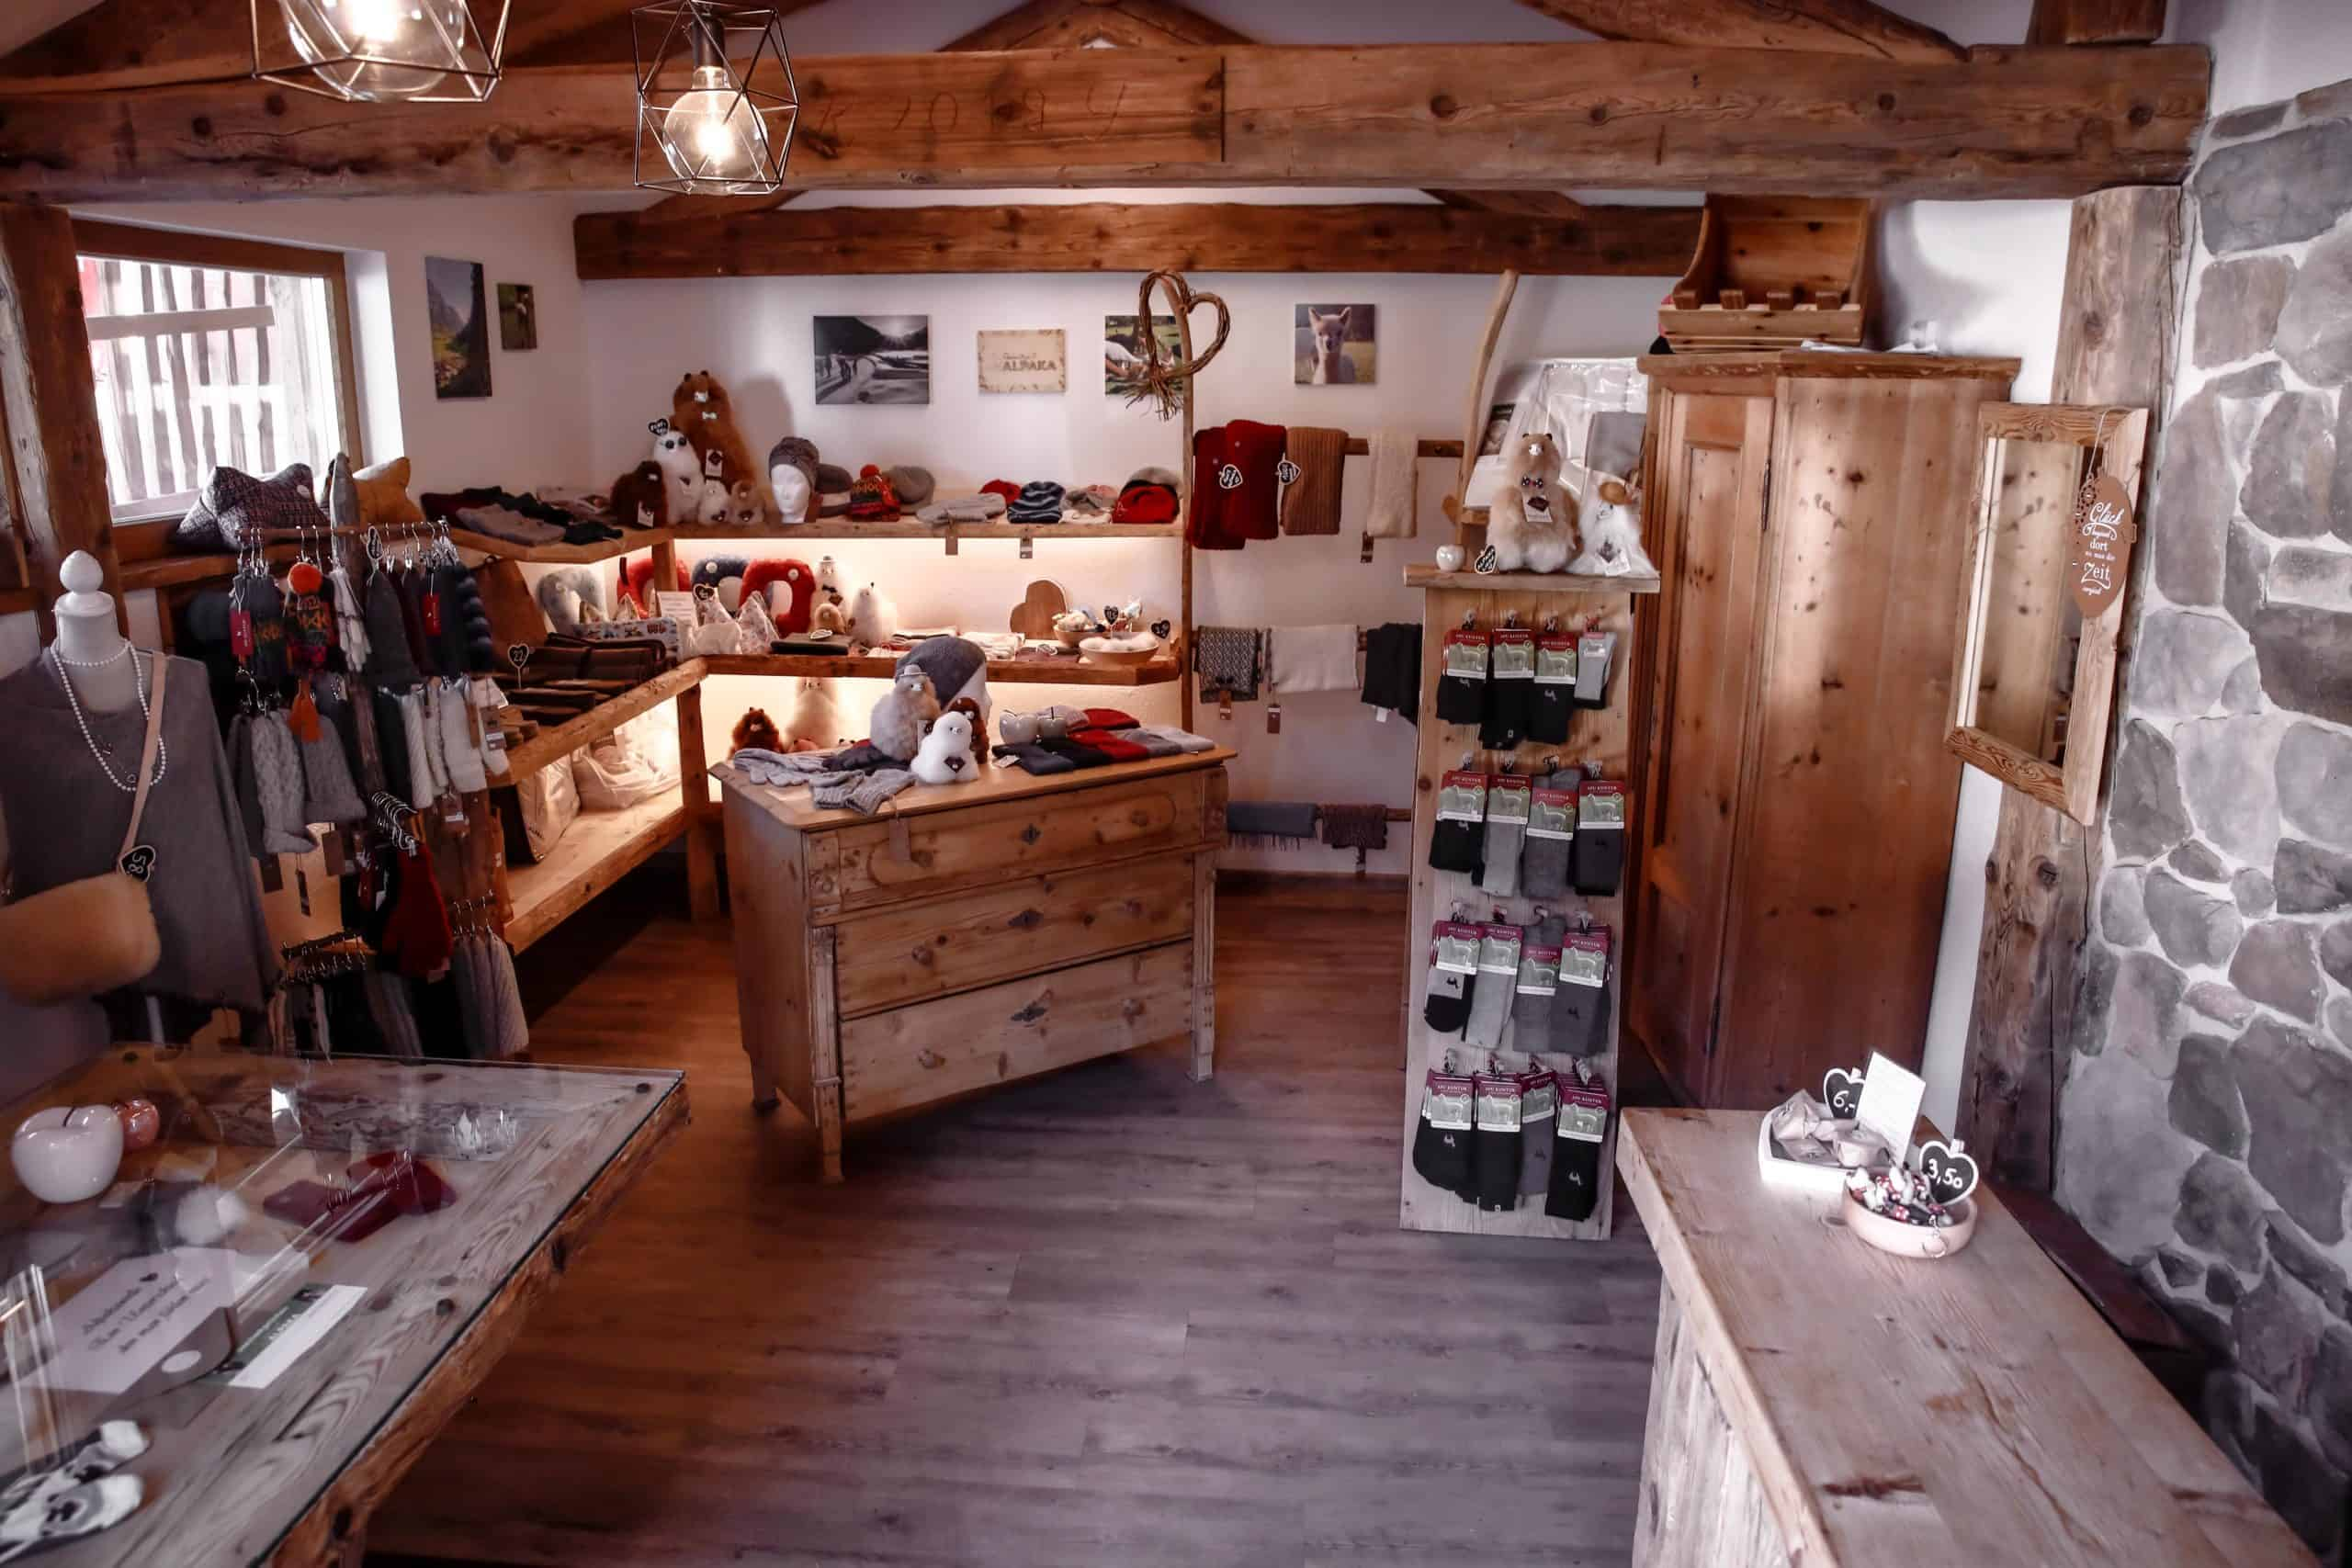 Gschnitzer_Alpaka-Alpakas-Wanderungen-Tirol-11-scaled Hofladen